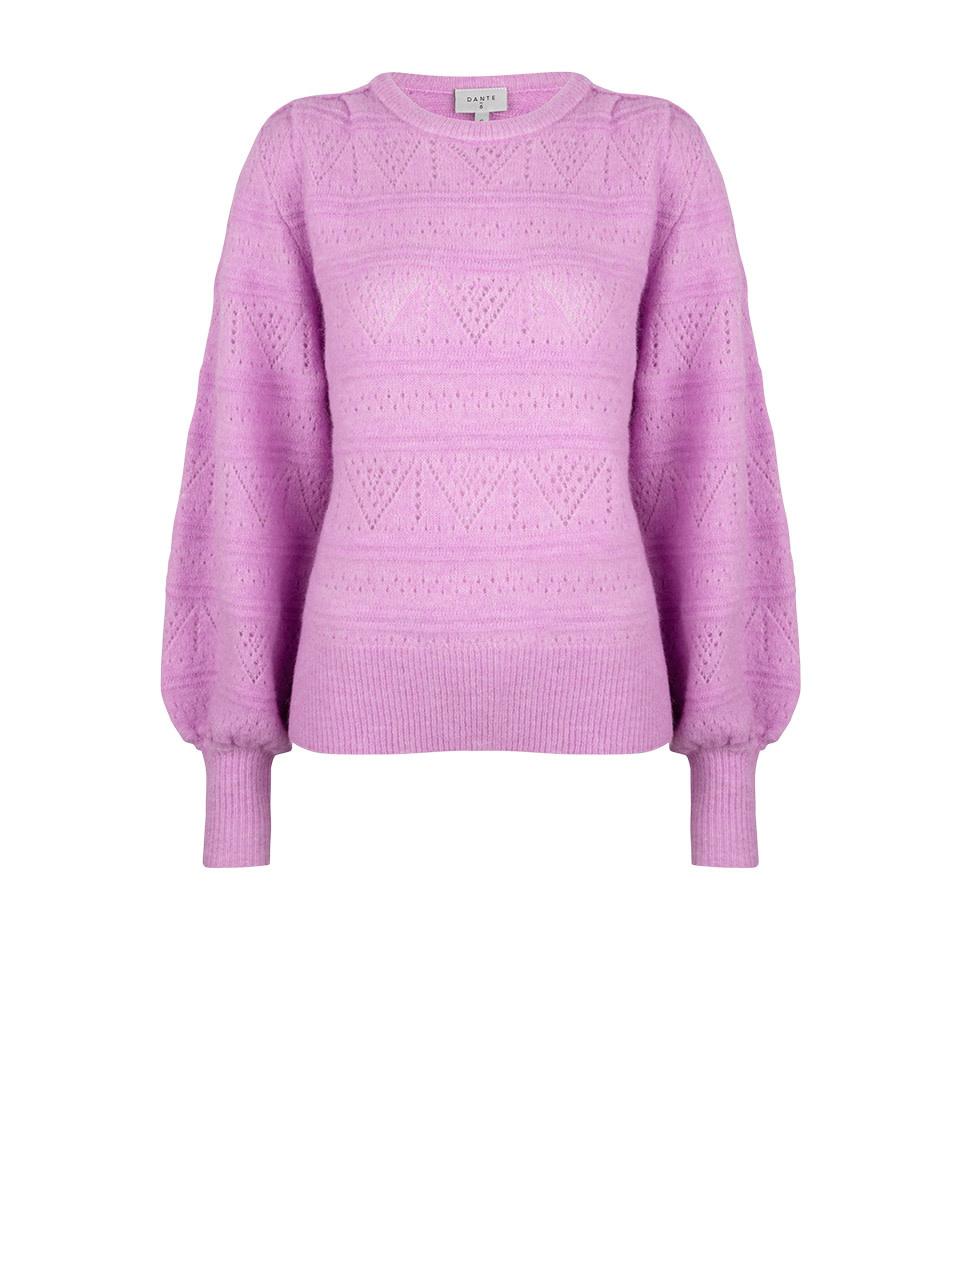 Valana ajour sweater pastel Pink-1